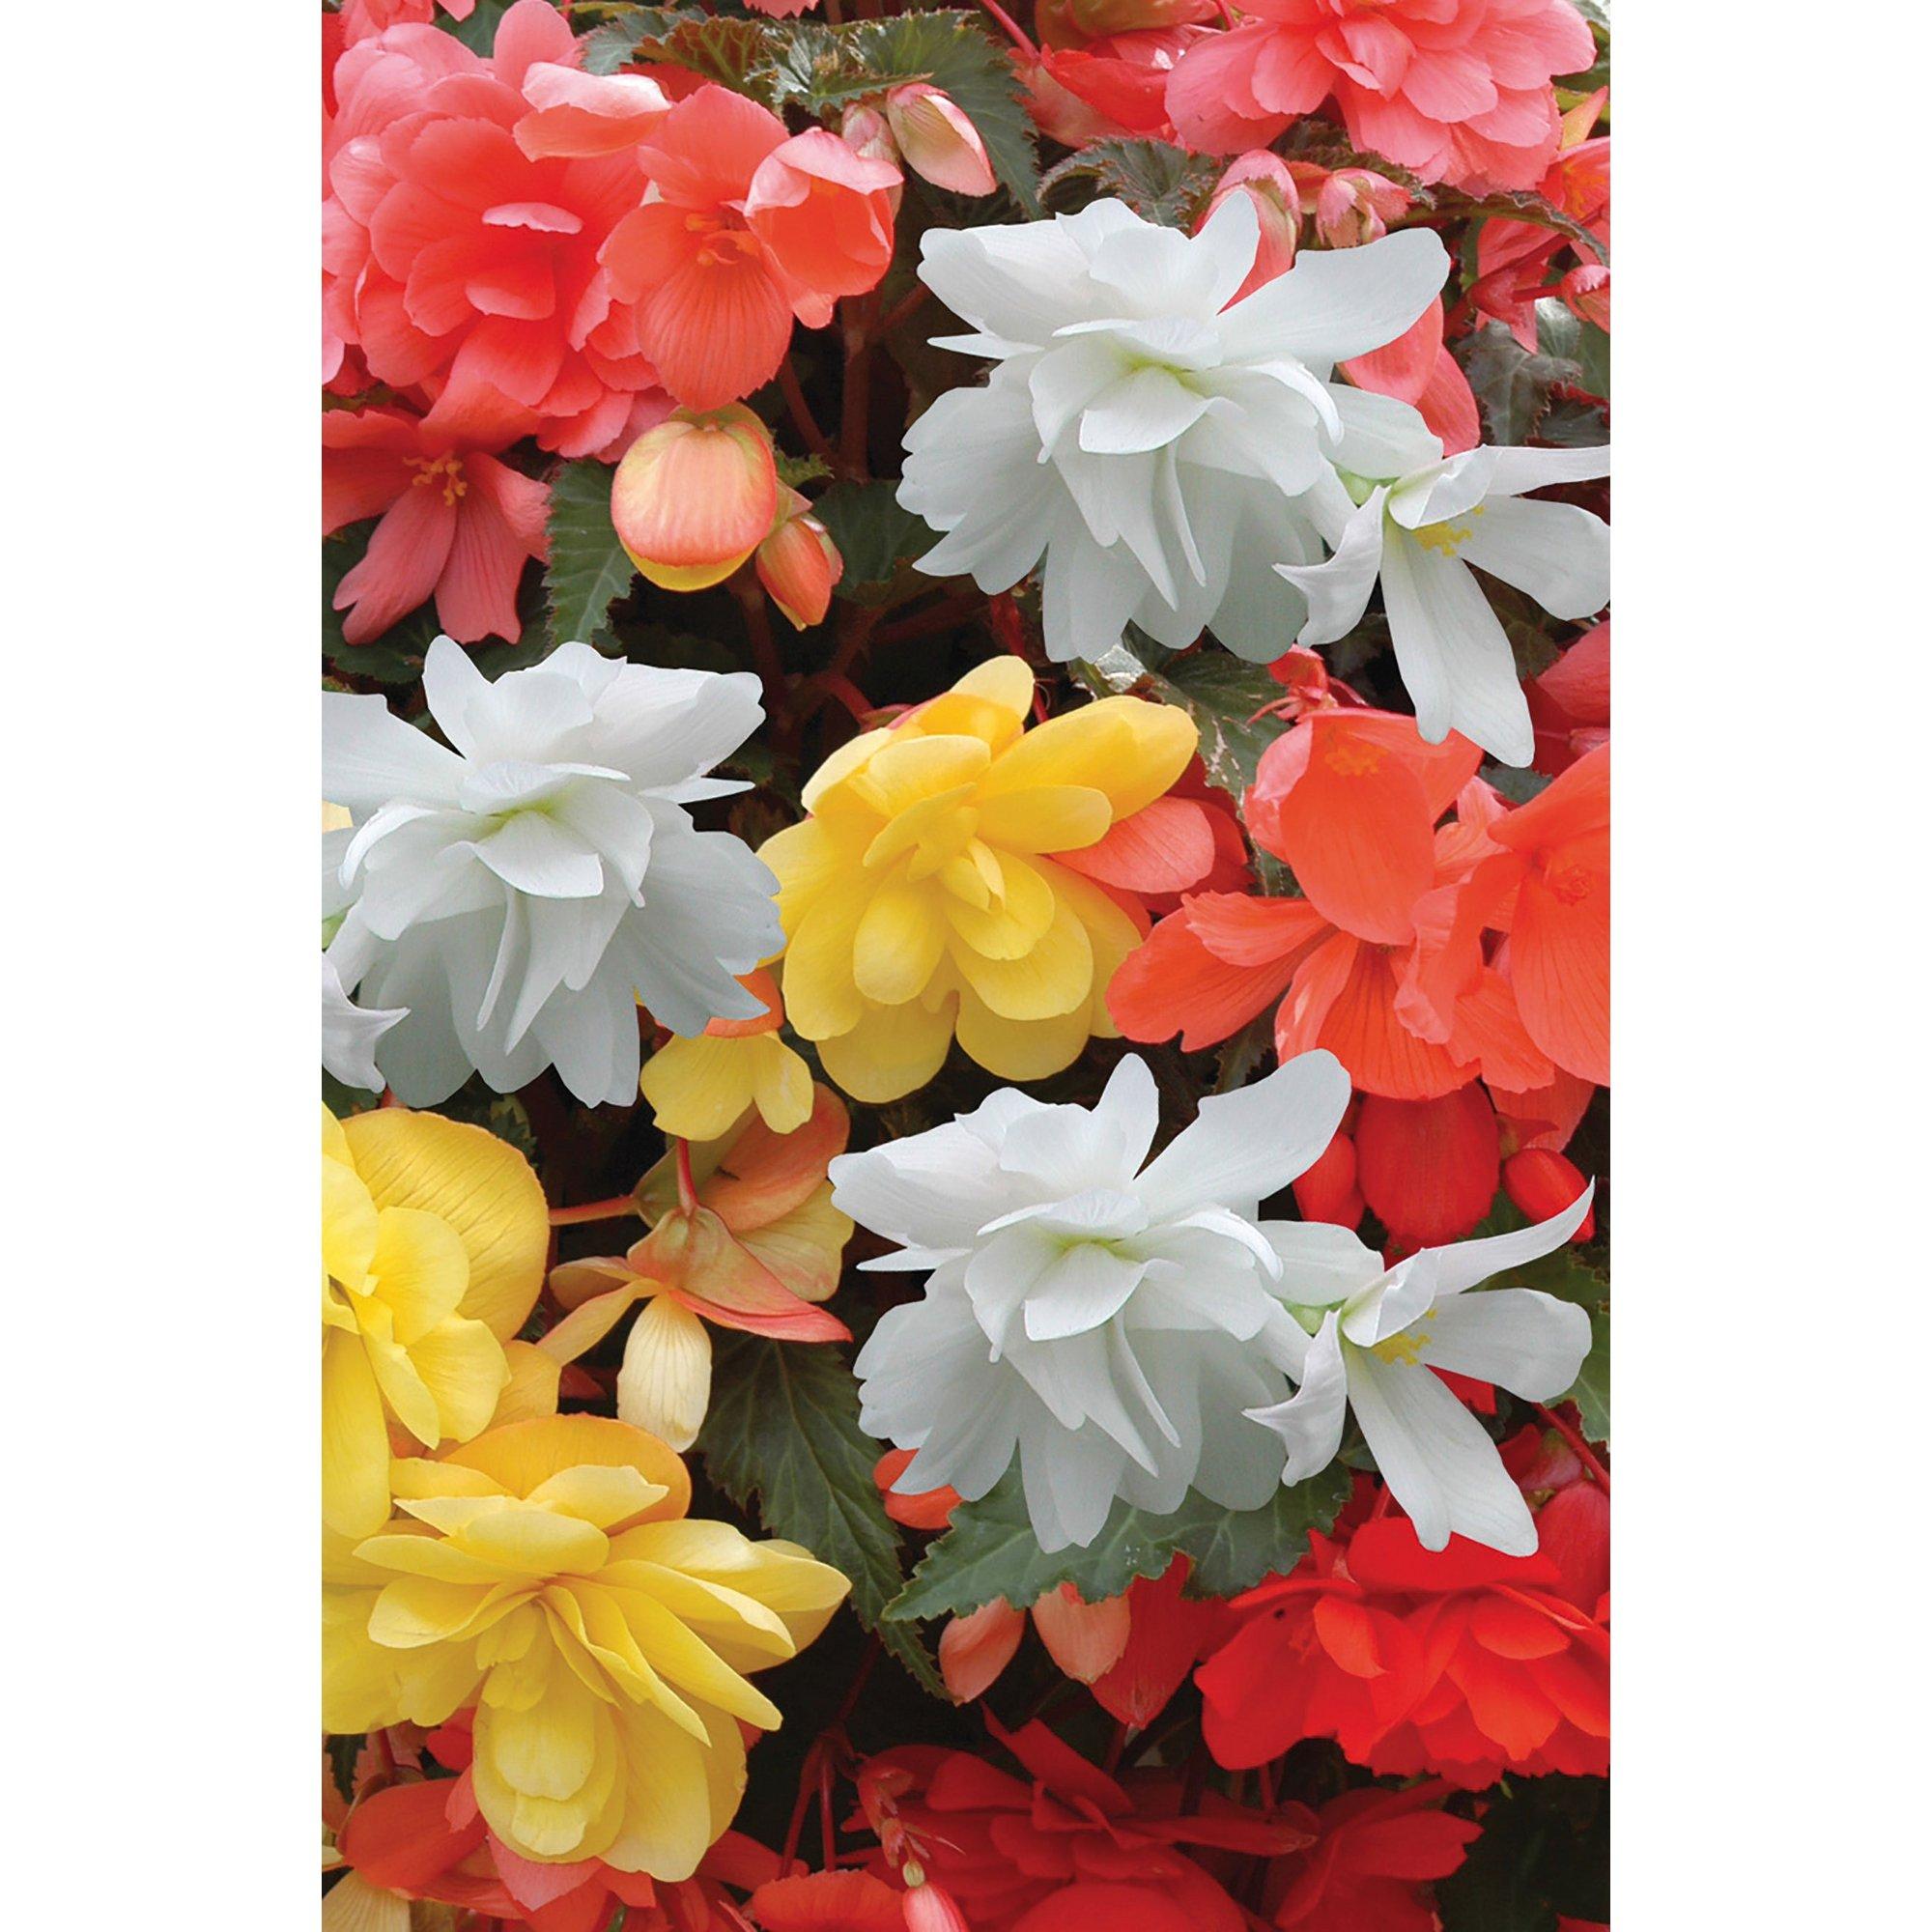 Image of 20 Begonia Illumination Mixed Garden Ready Plants